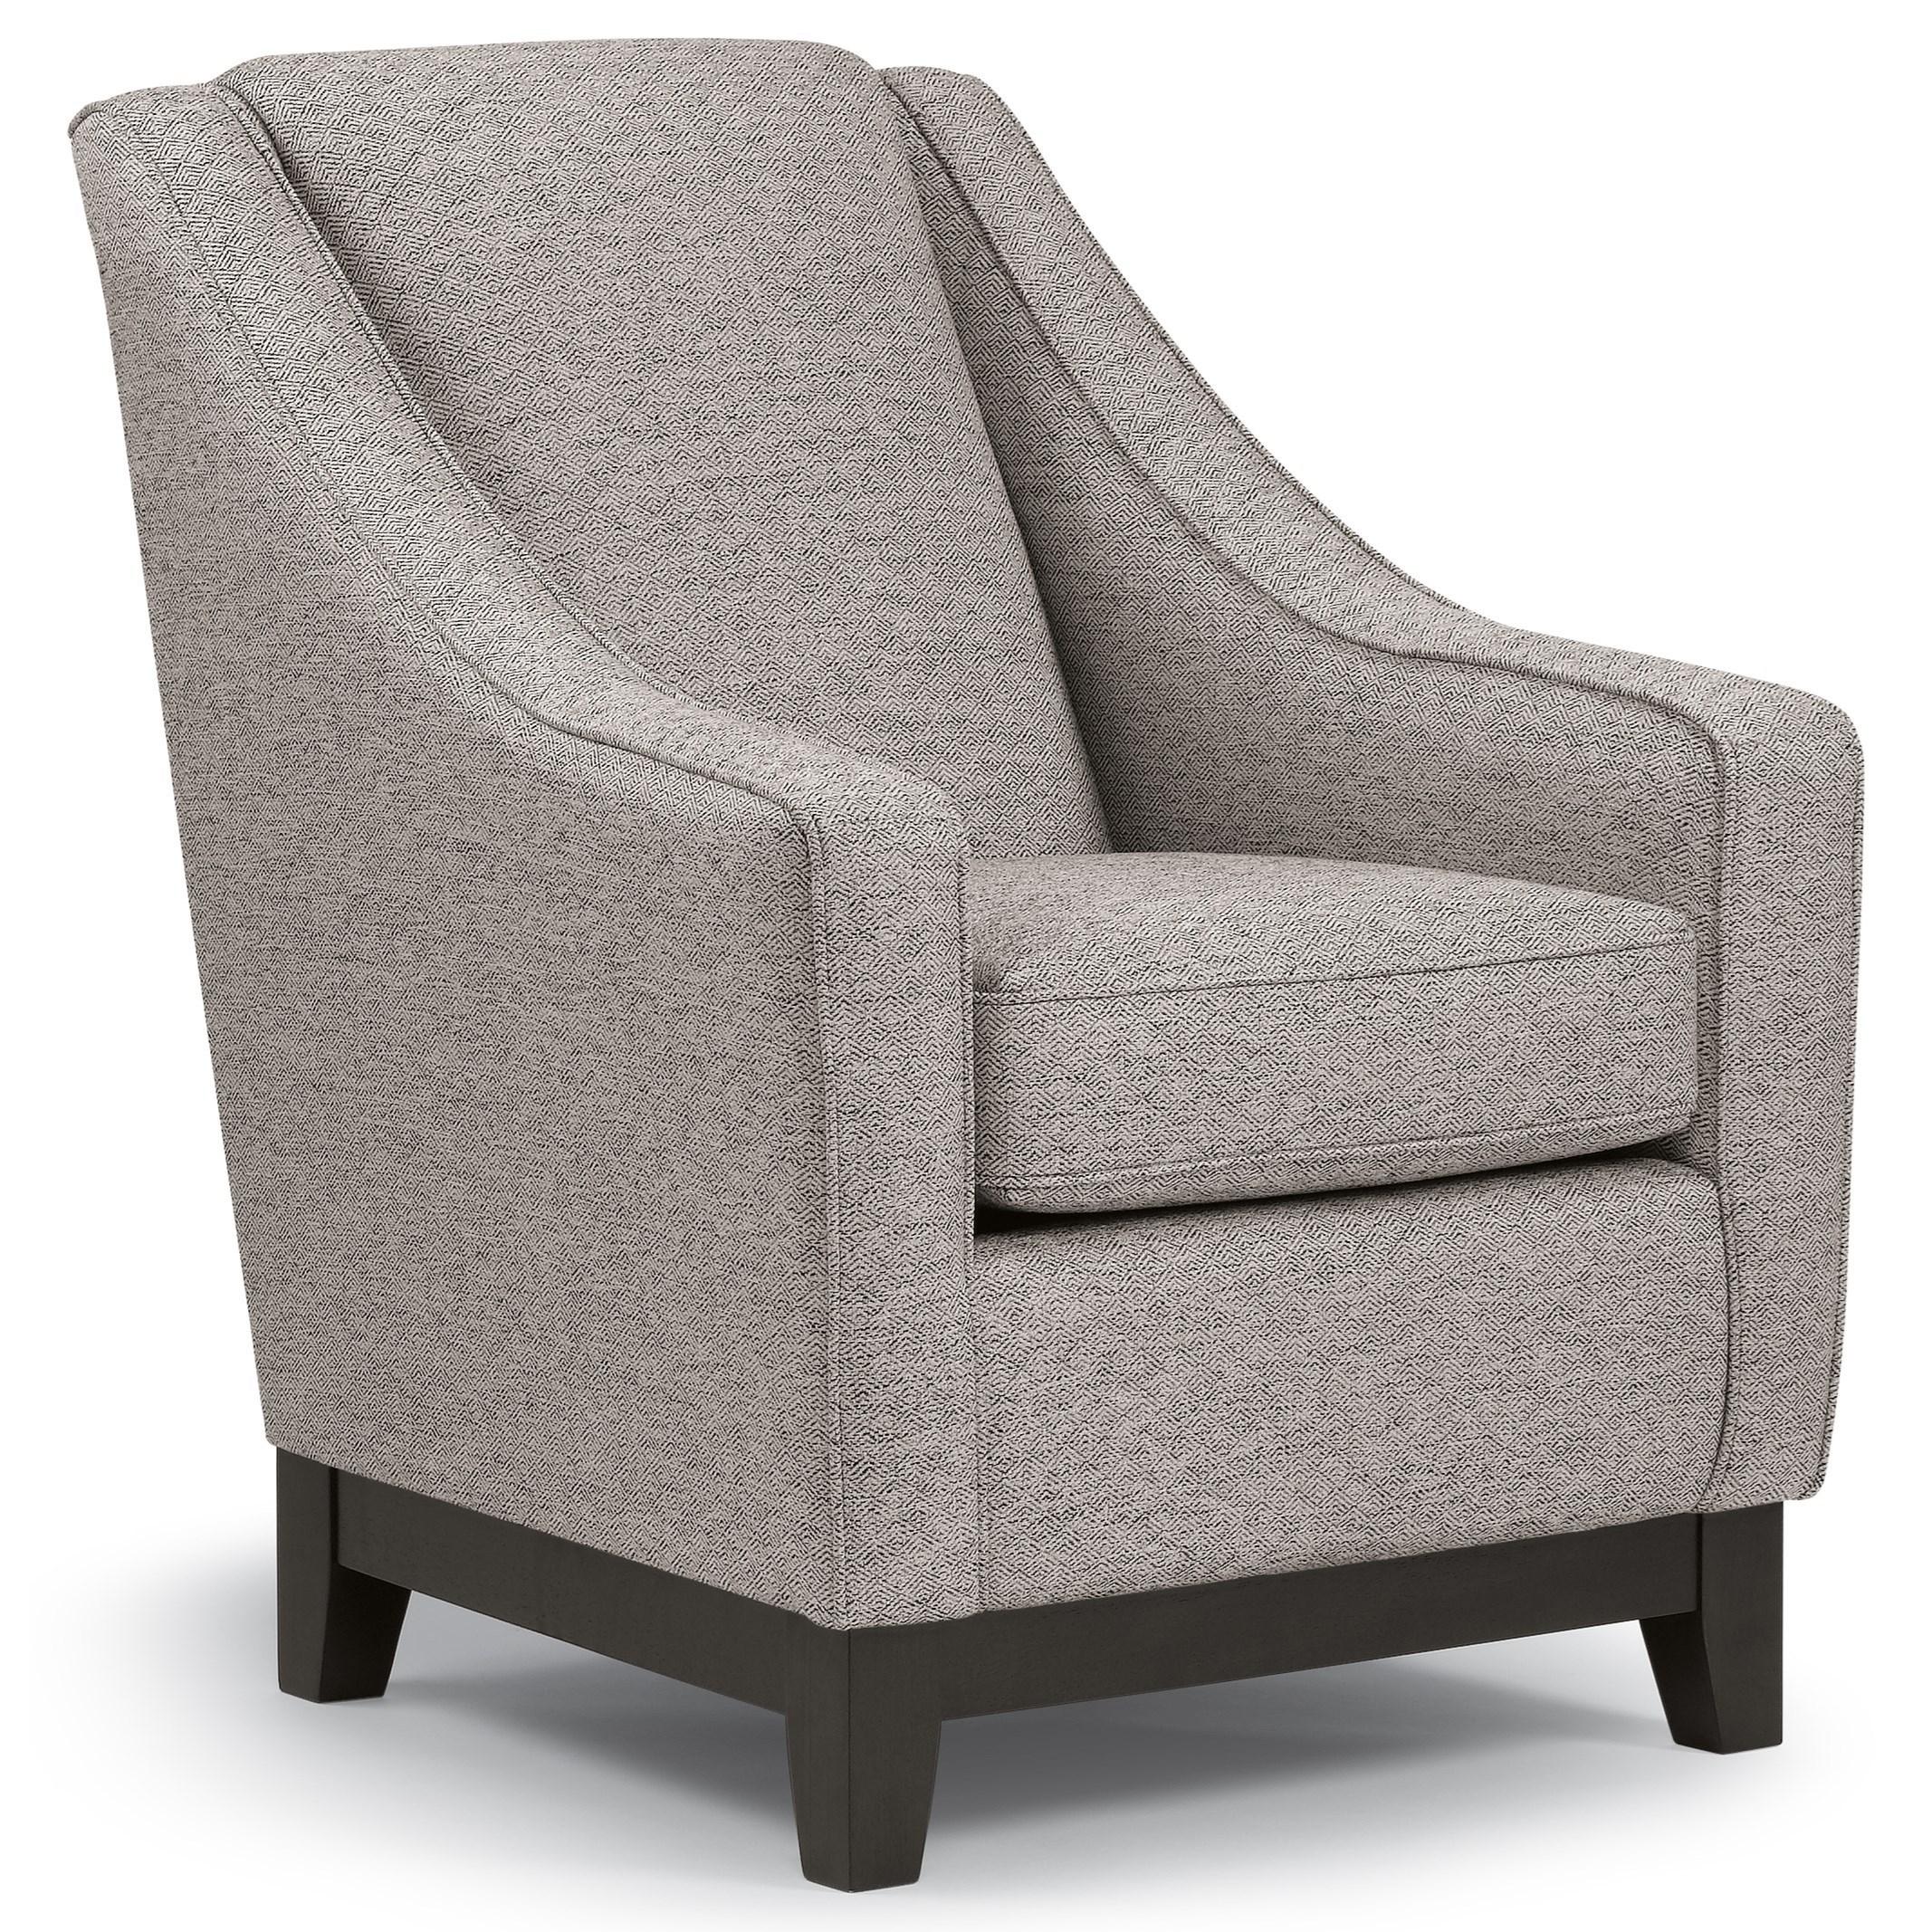 Best Home Furnishings Chairs - Club Mariko Club Chair - Item Number: 2070-21083B